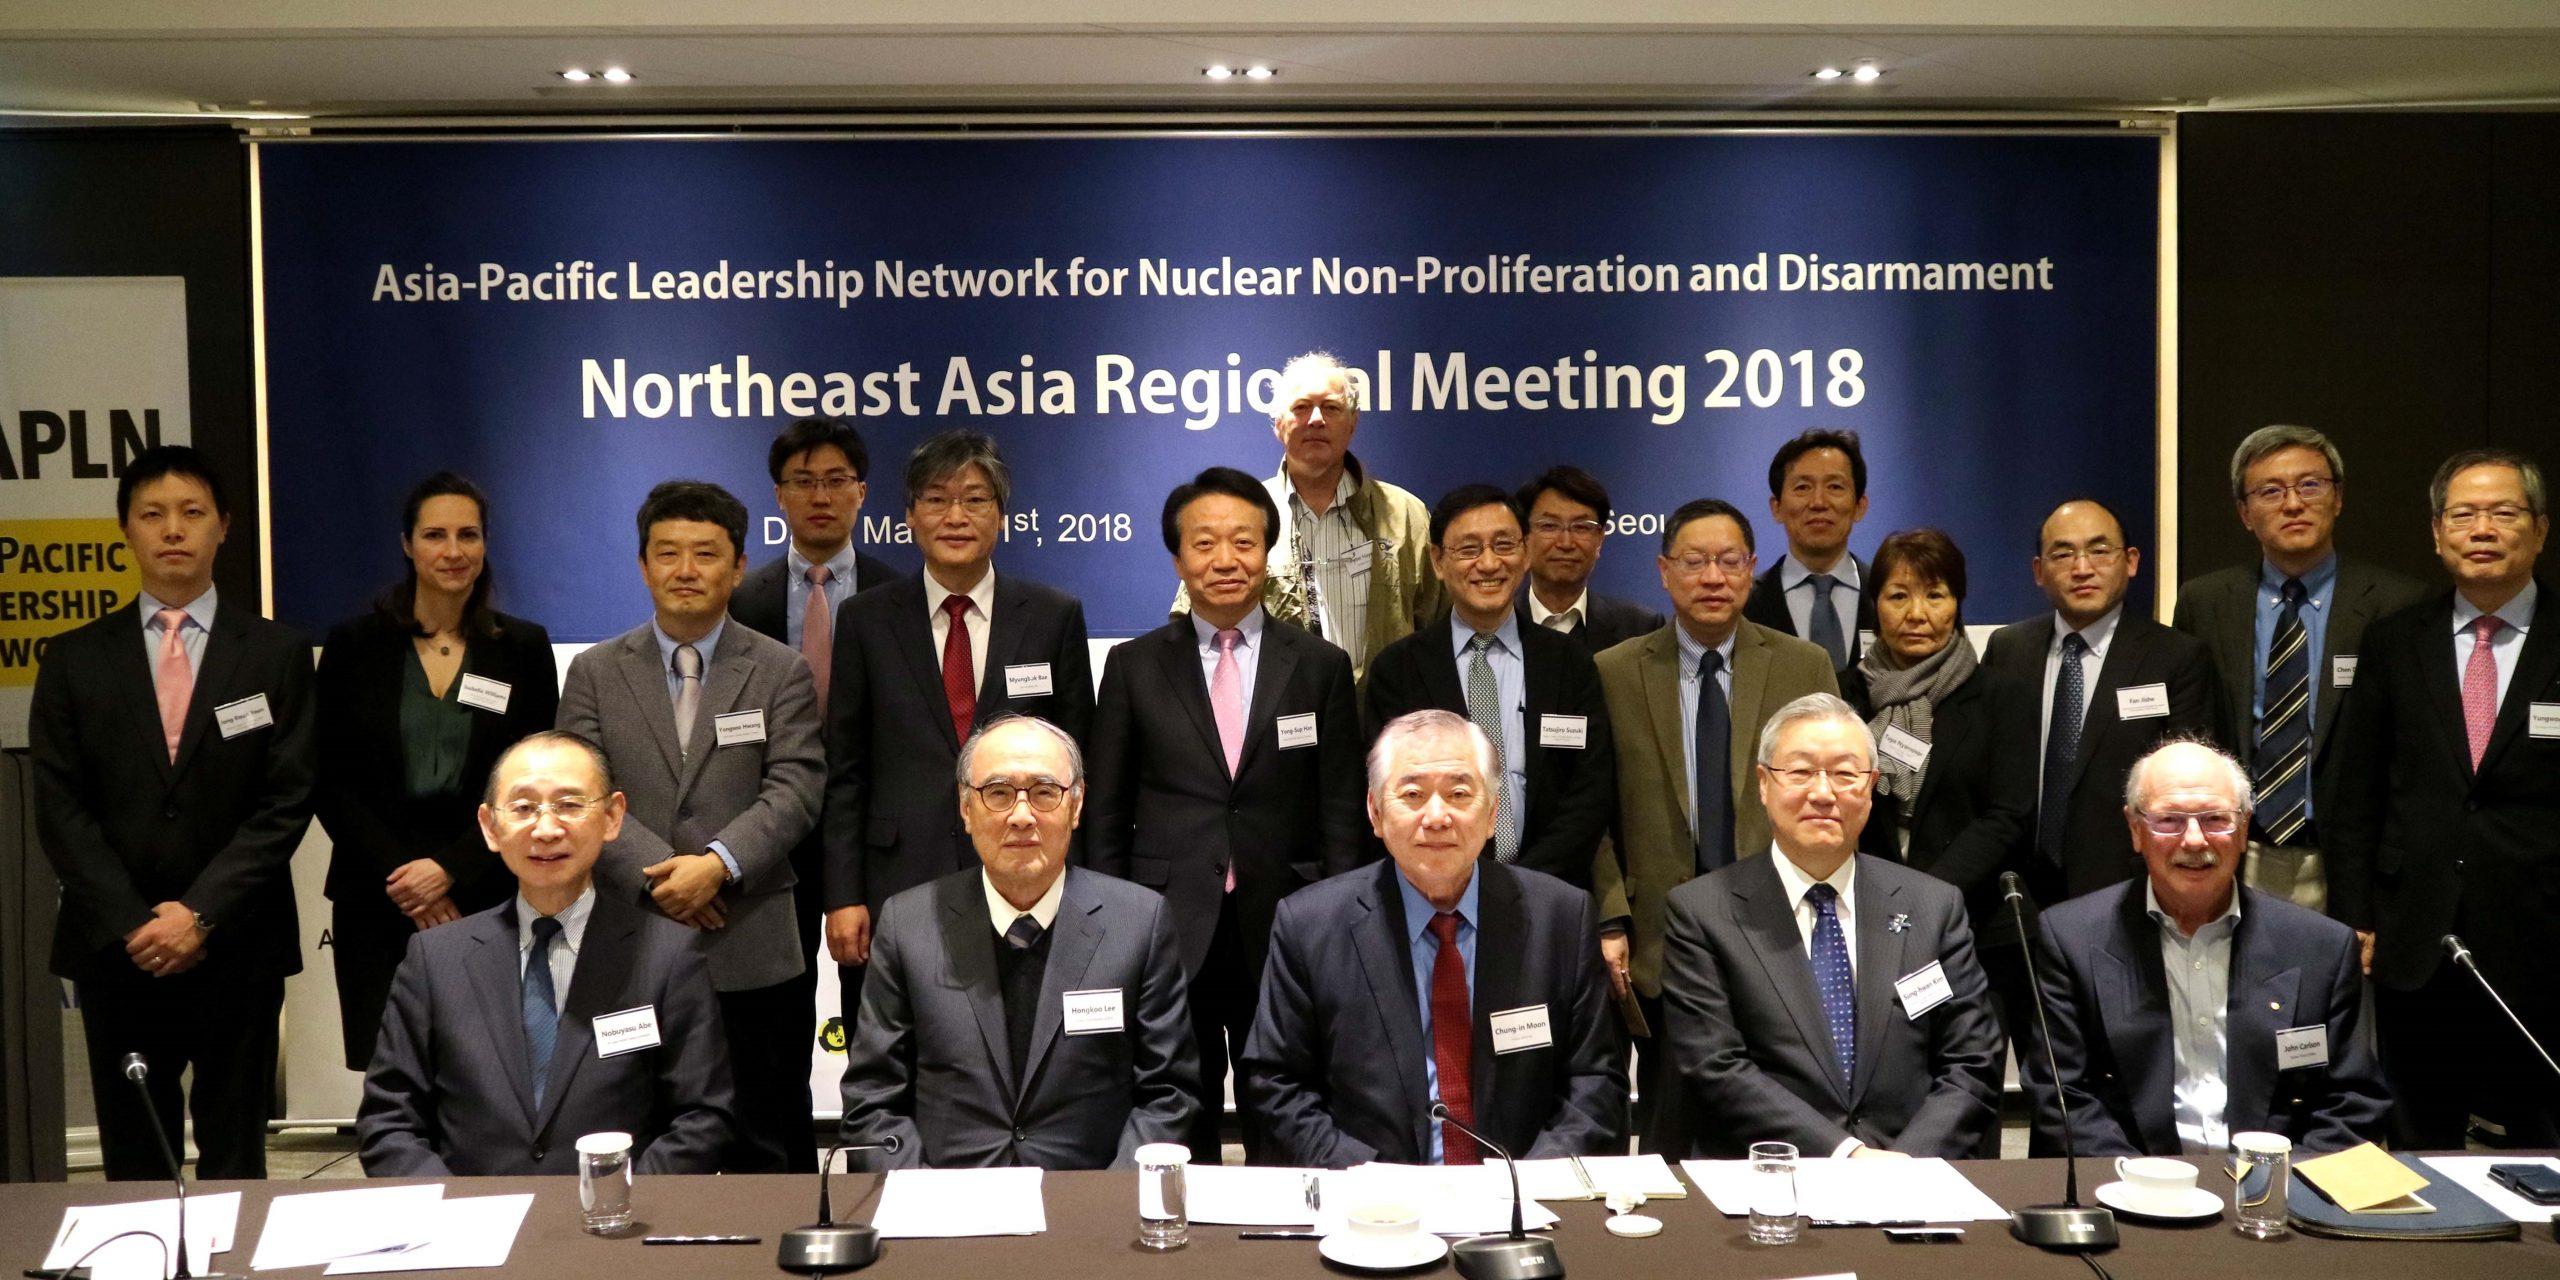 Northeast Asia Regional Meeting 2018